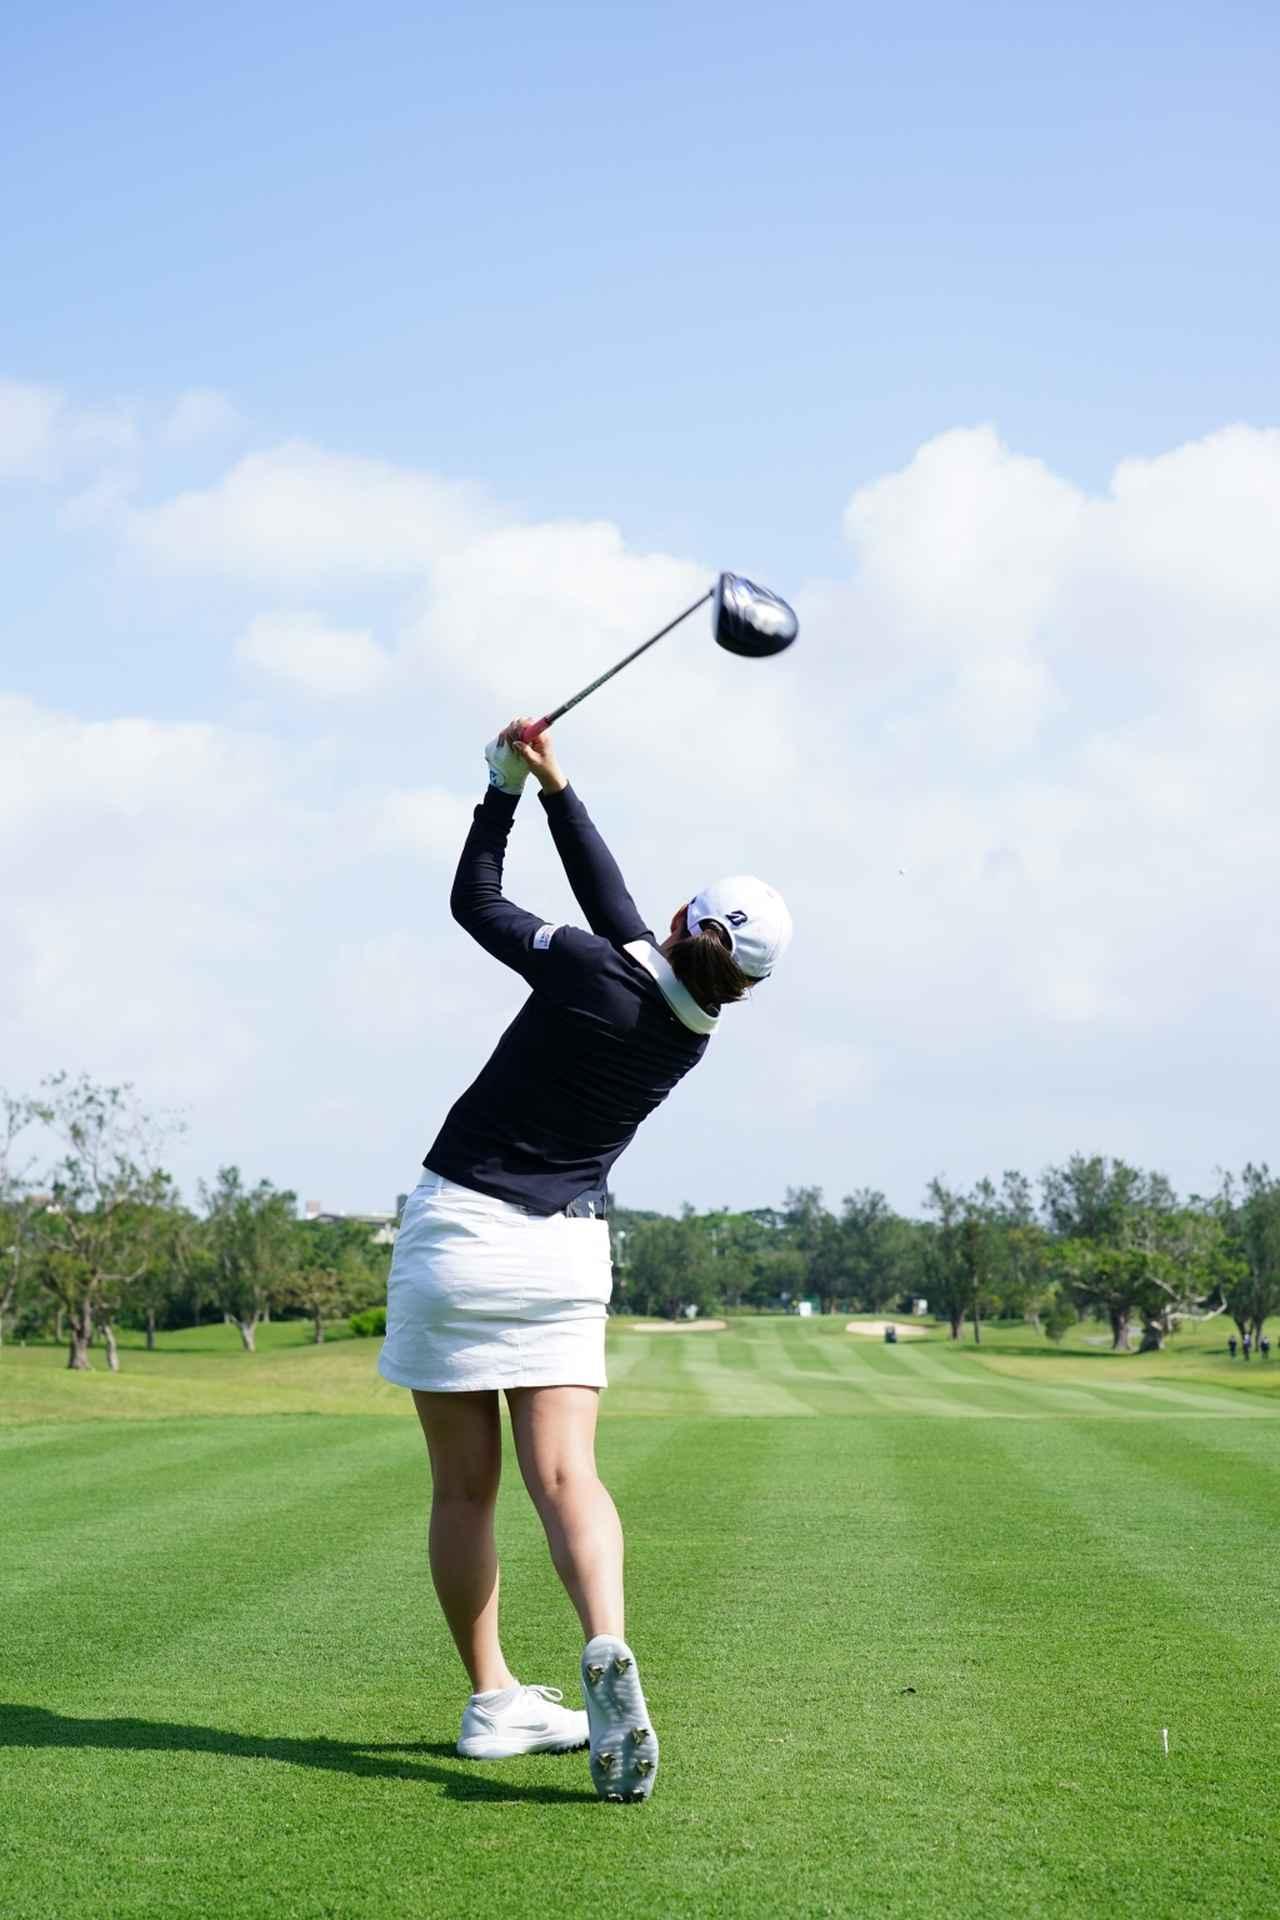 Images : 18番目の画像 - 丹萌乃のドライバー連続写真 - みんなのゴルフダイジェスト